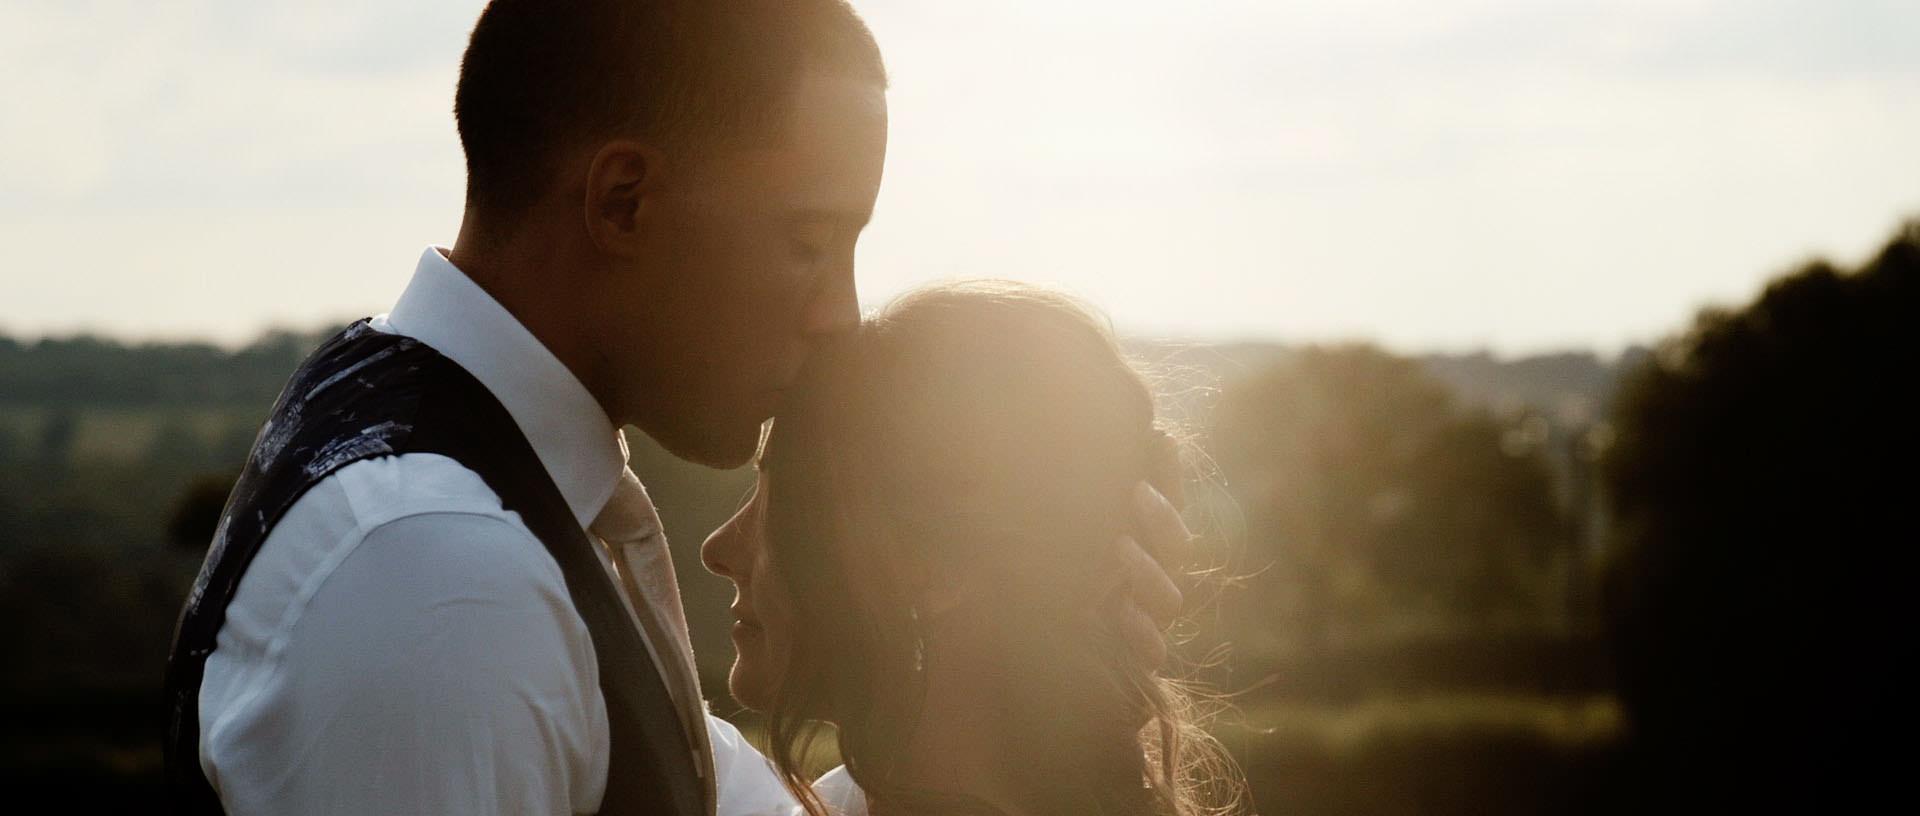 Hyde Barn Colswolds Wedding Verity-Jade & Kai 4 Cropped.jpg